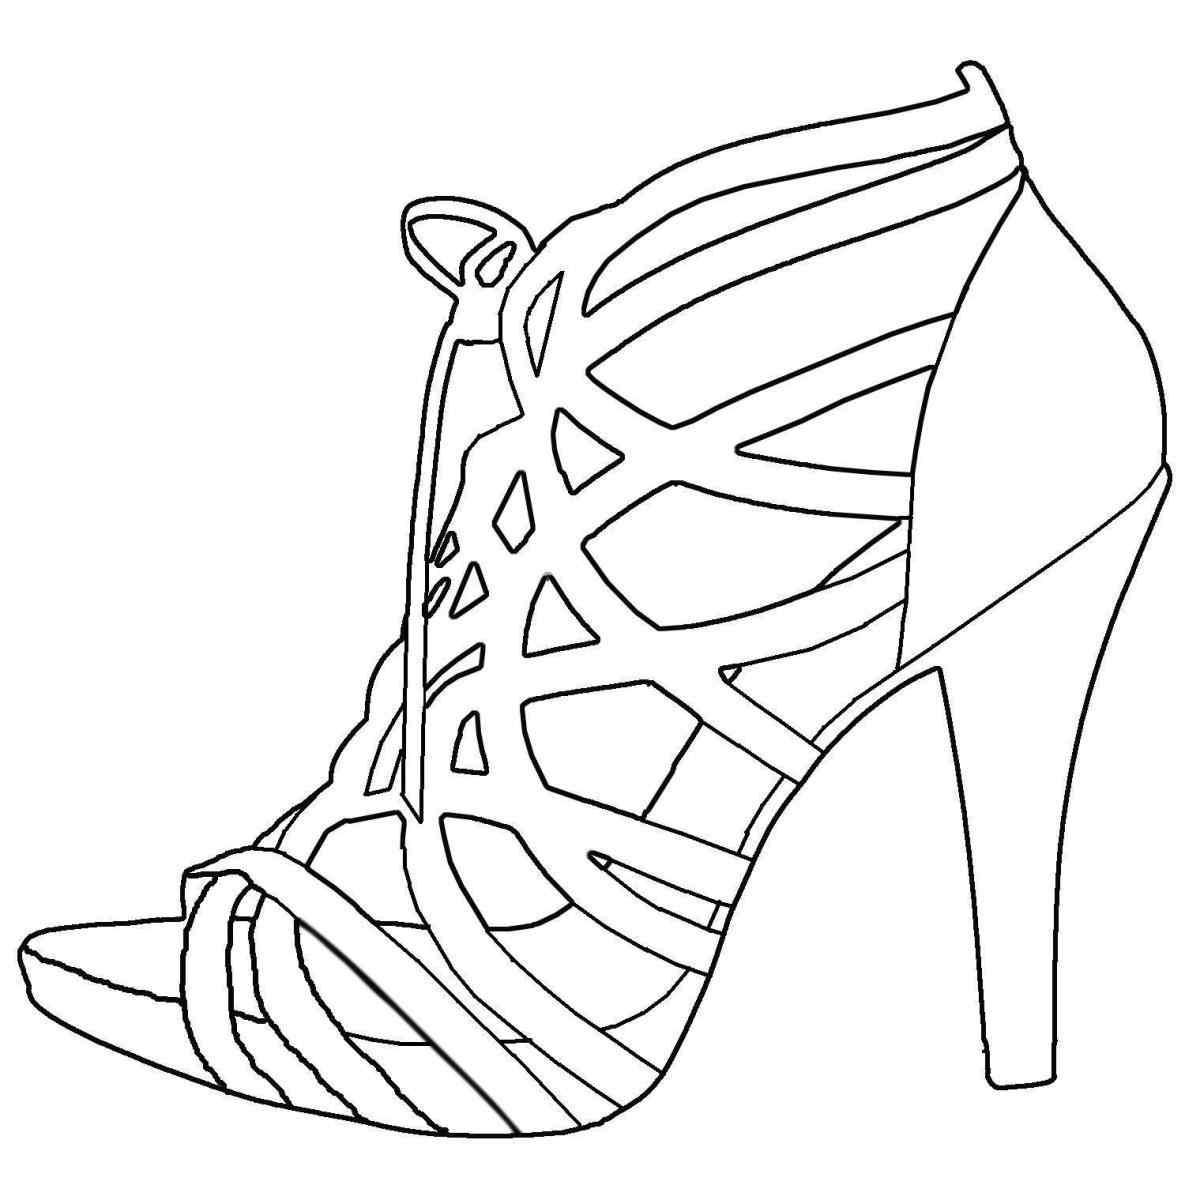 Heel Drawing at GetDrawings | Free download